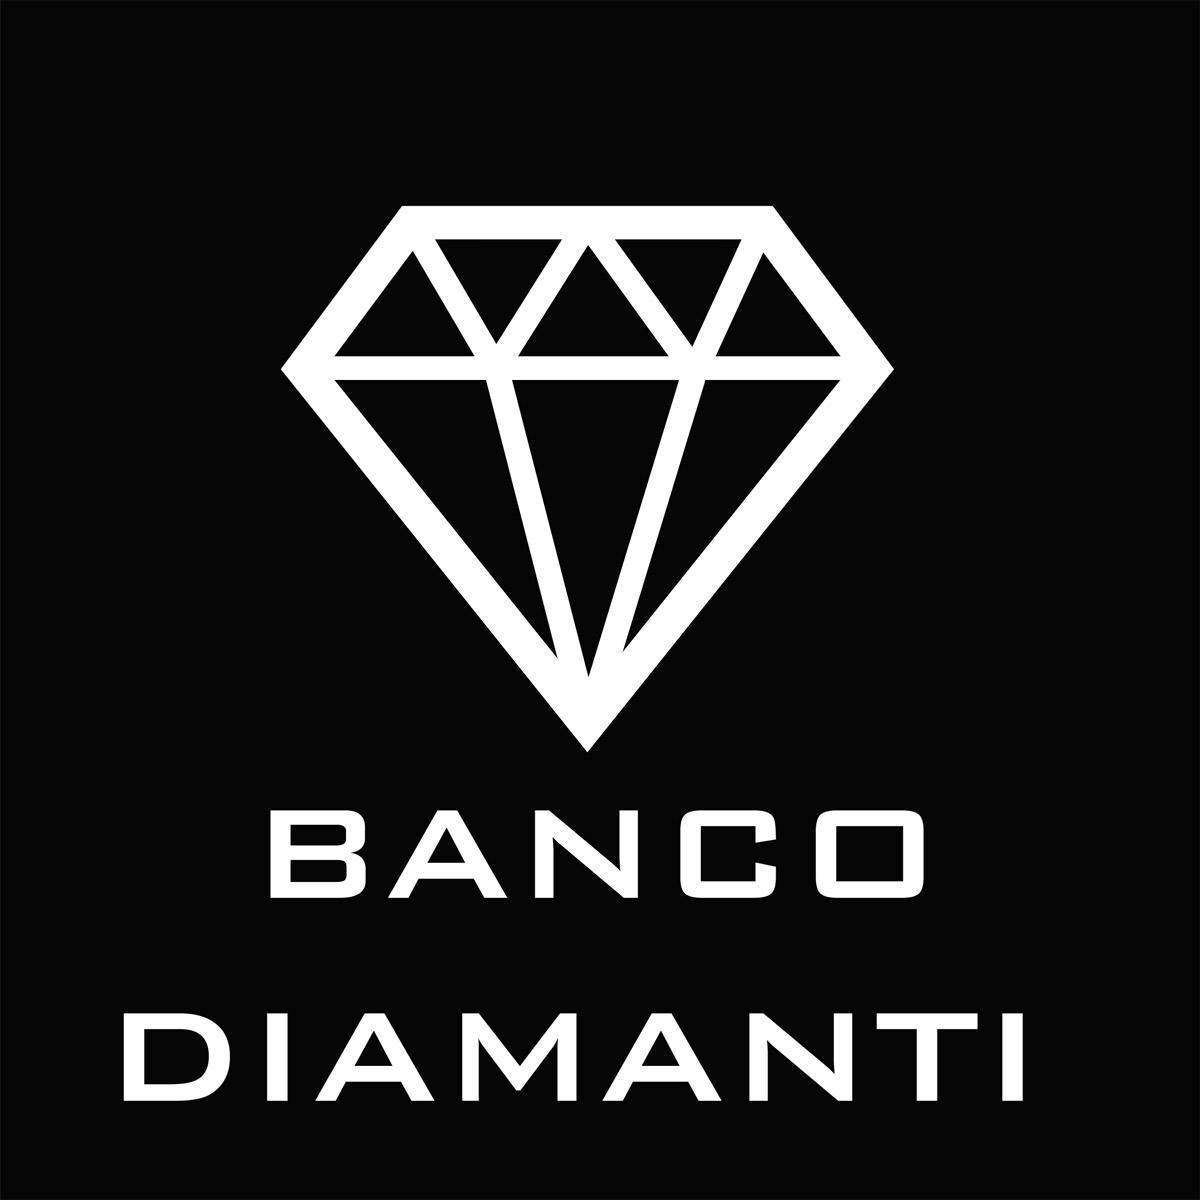 Vendere diamanti in banca, conviene?